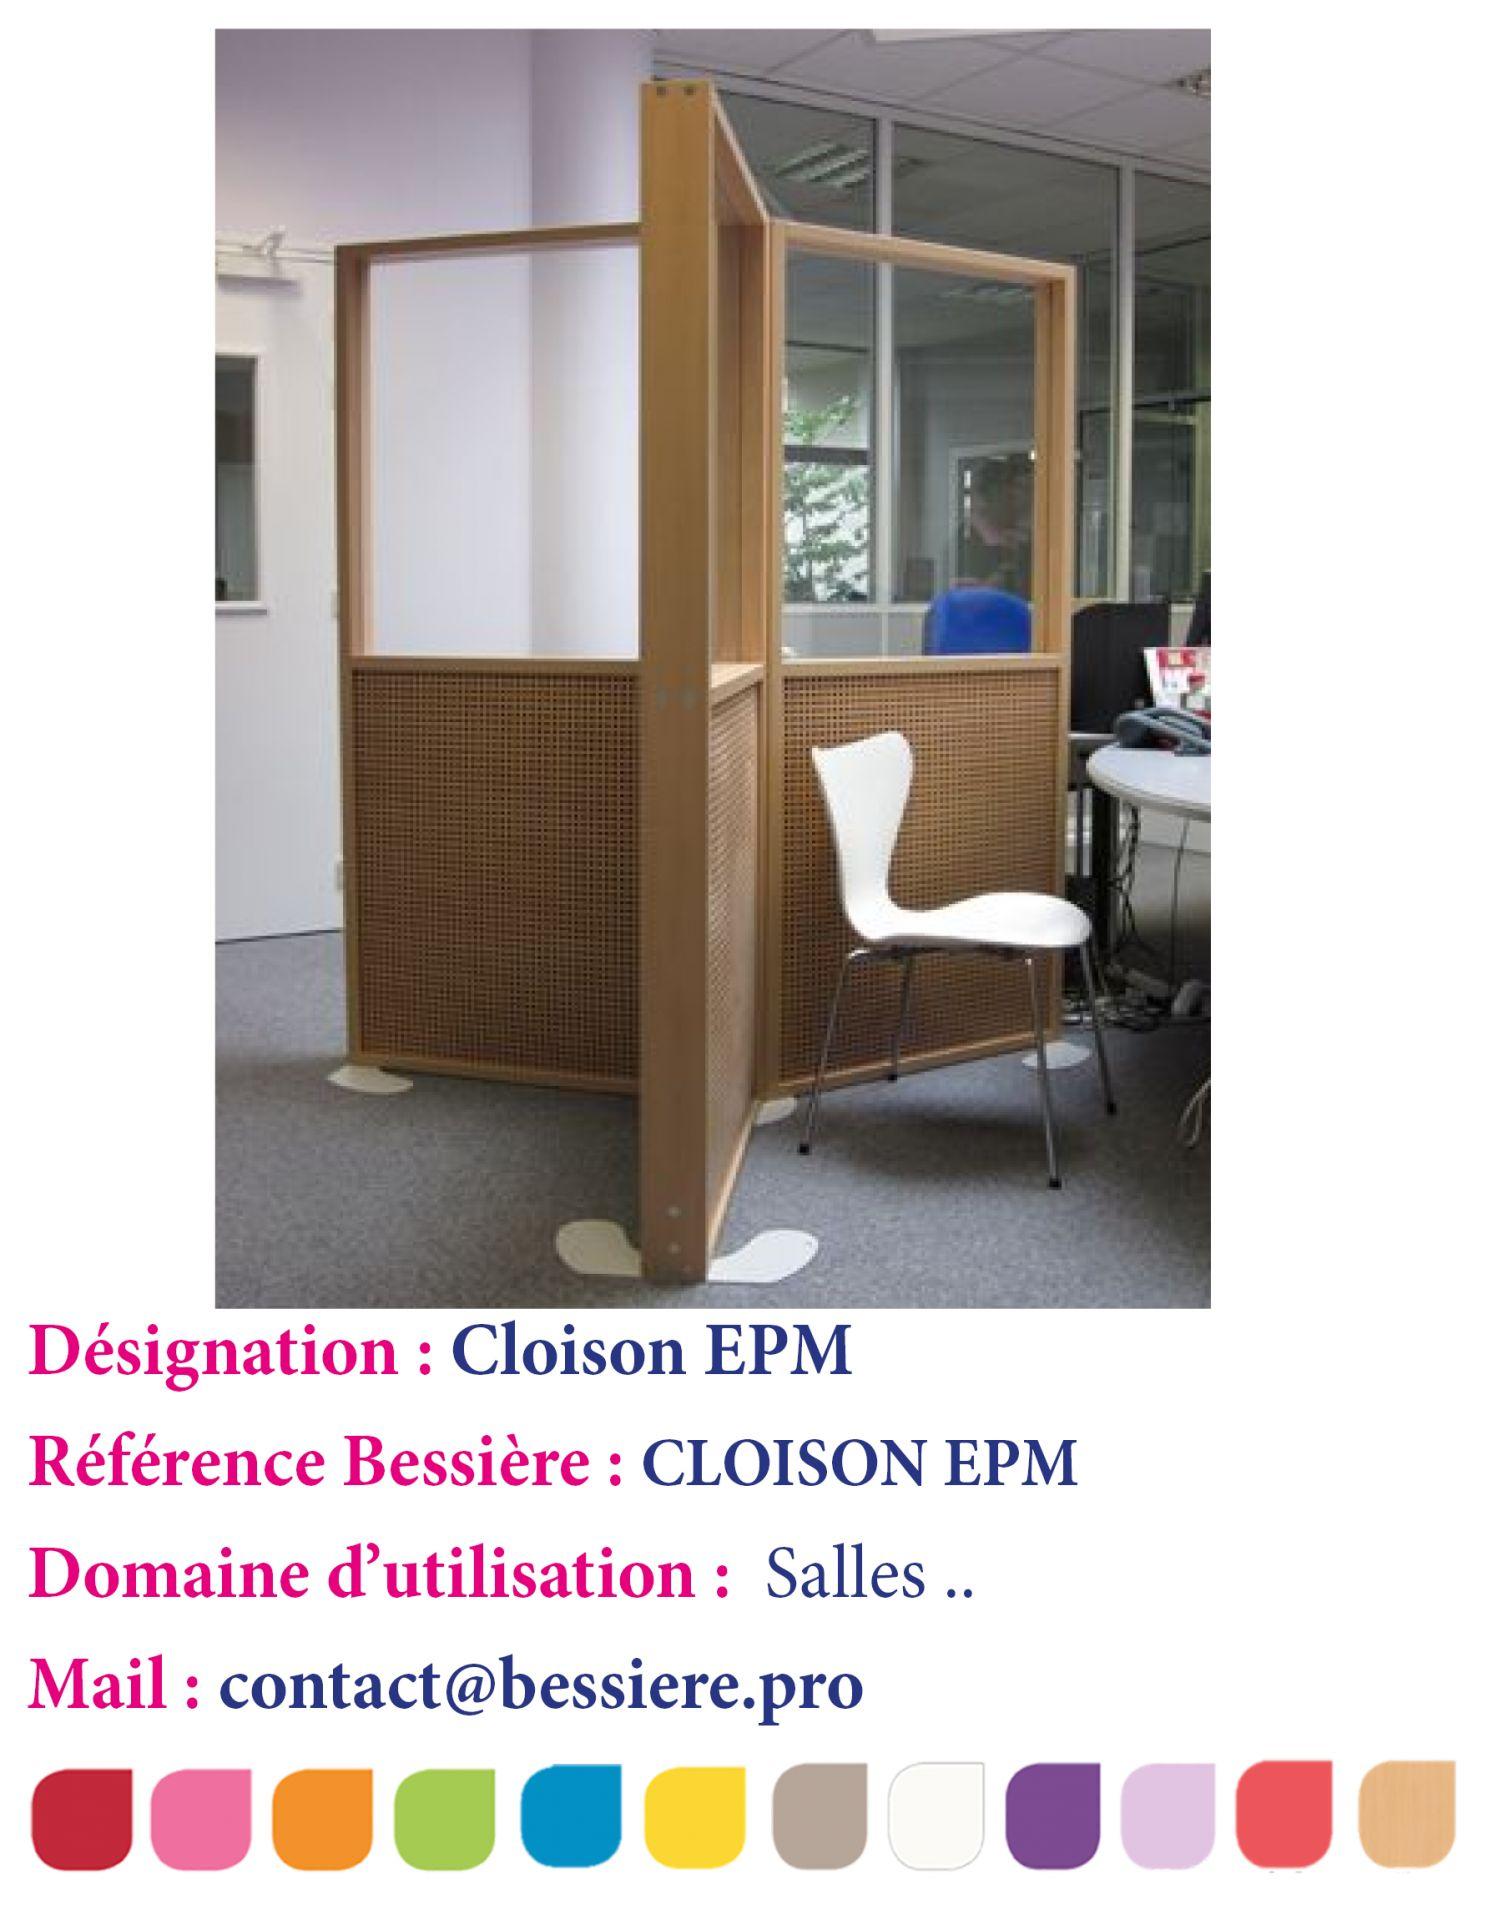 Cloison mobile ikea conceptions architecturales - Cloisons mobiles ikea ...